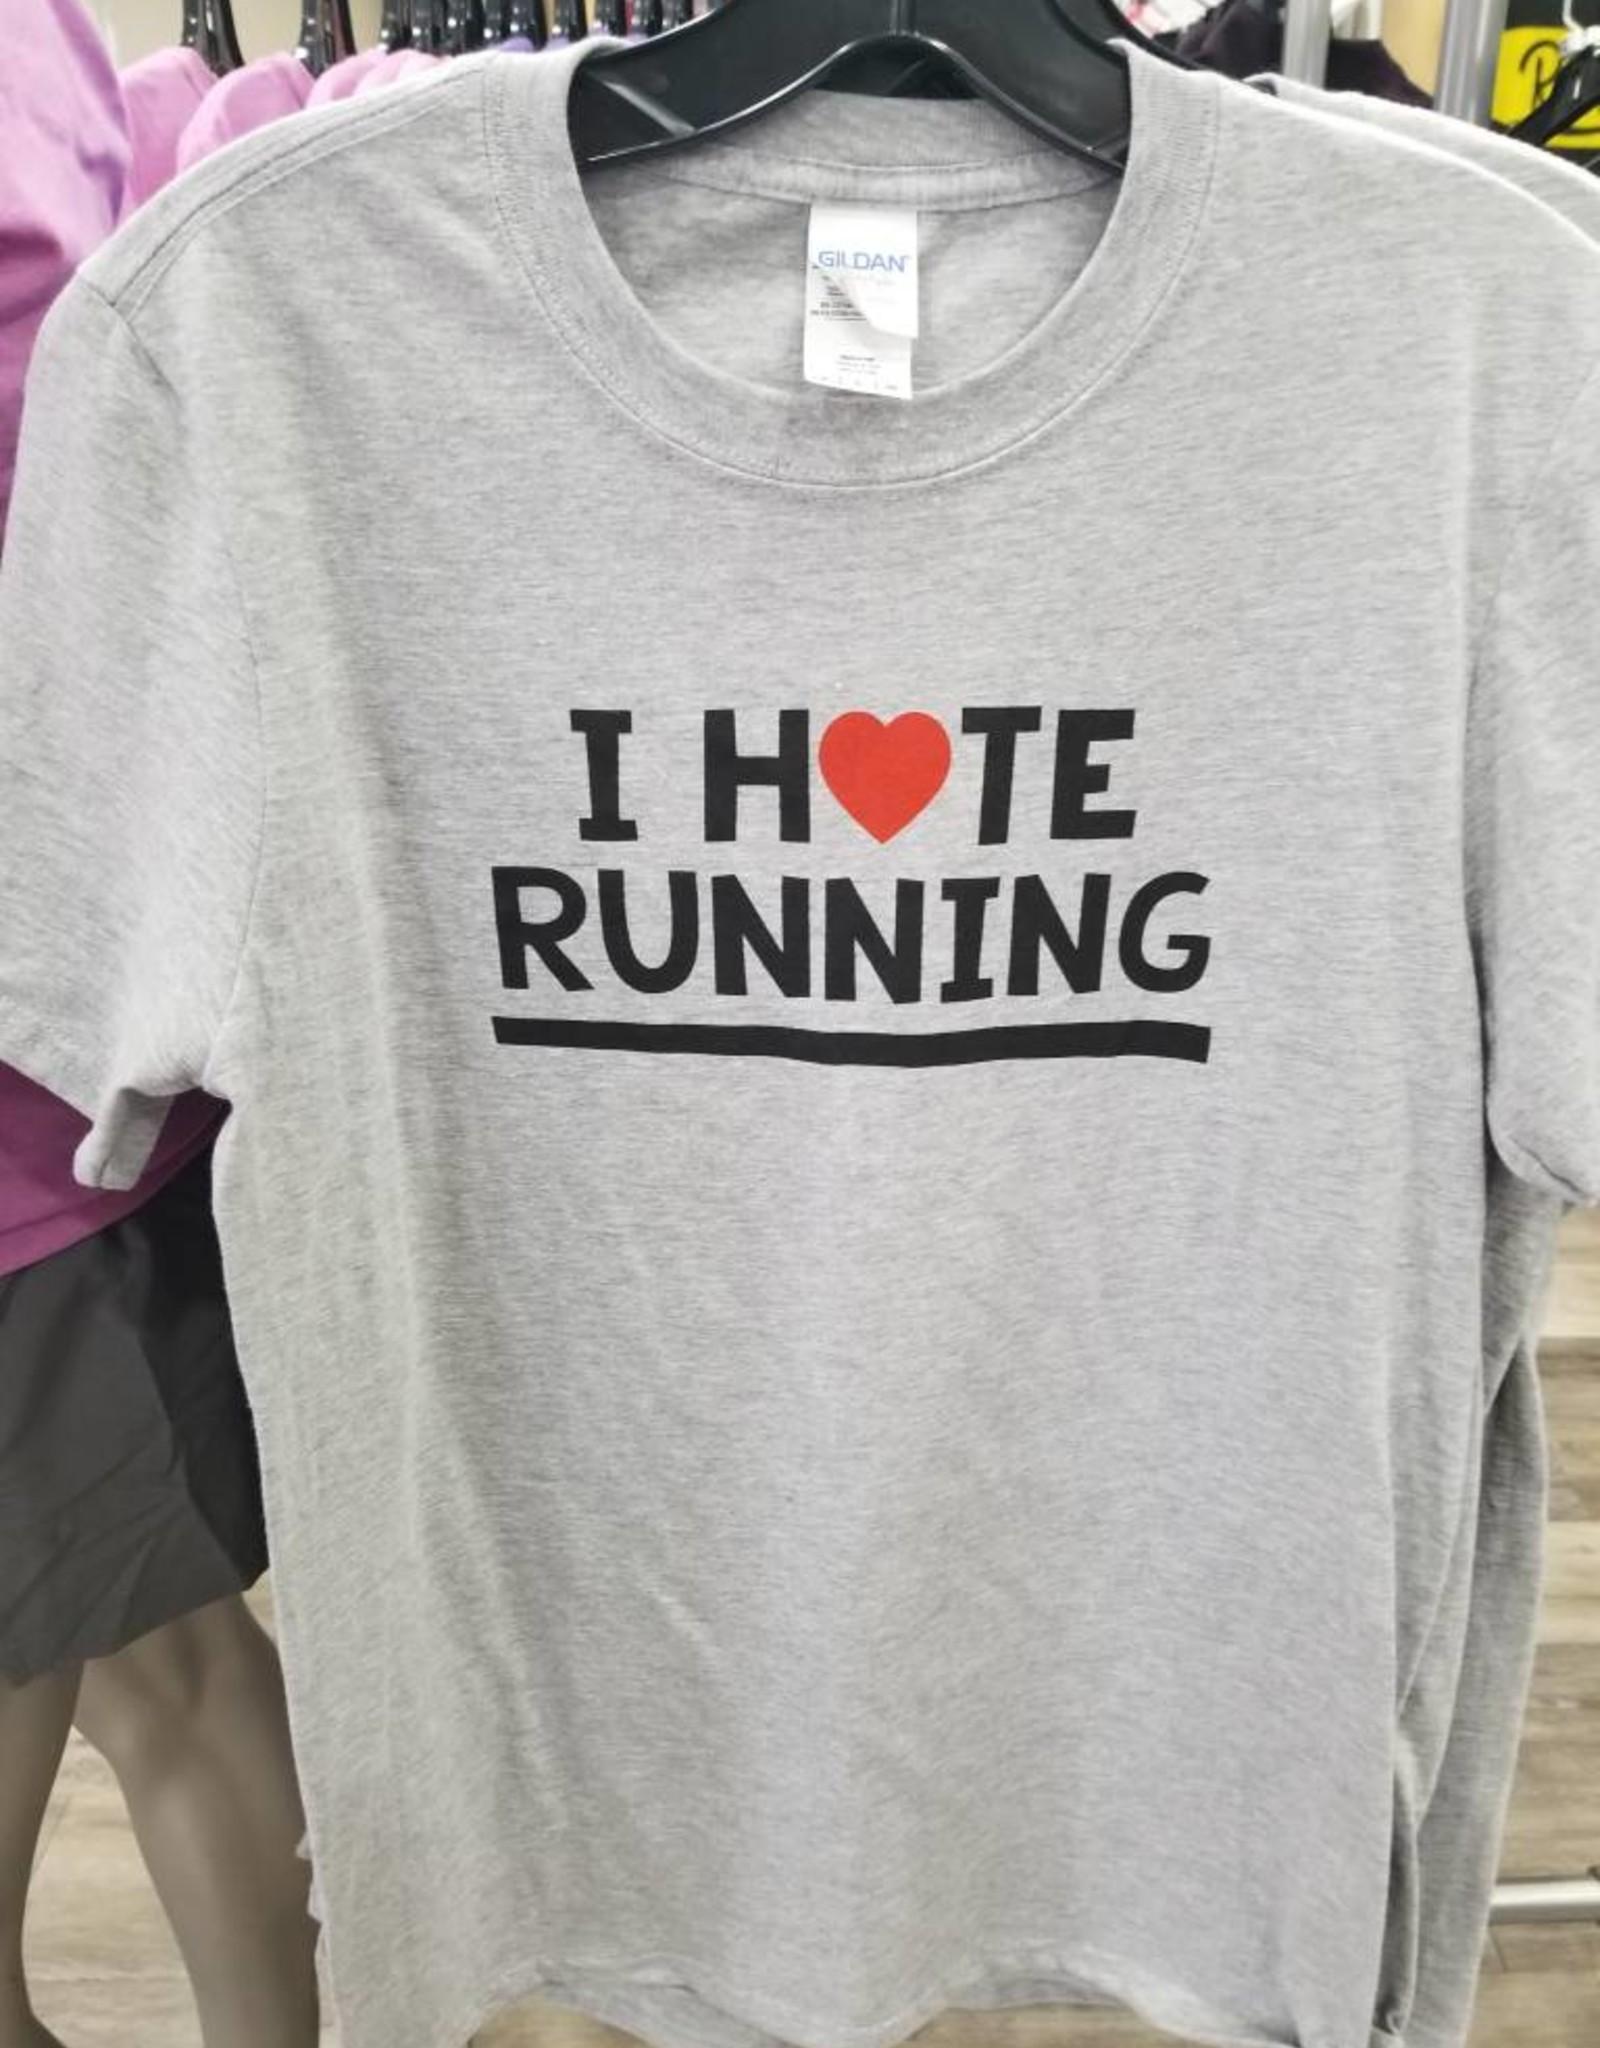 MRC I HATE RUNNING COTTON TEE